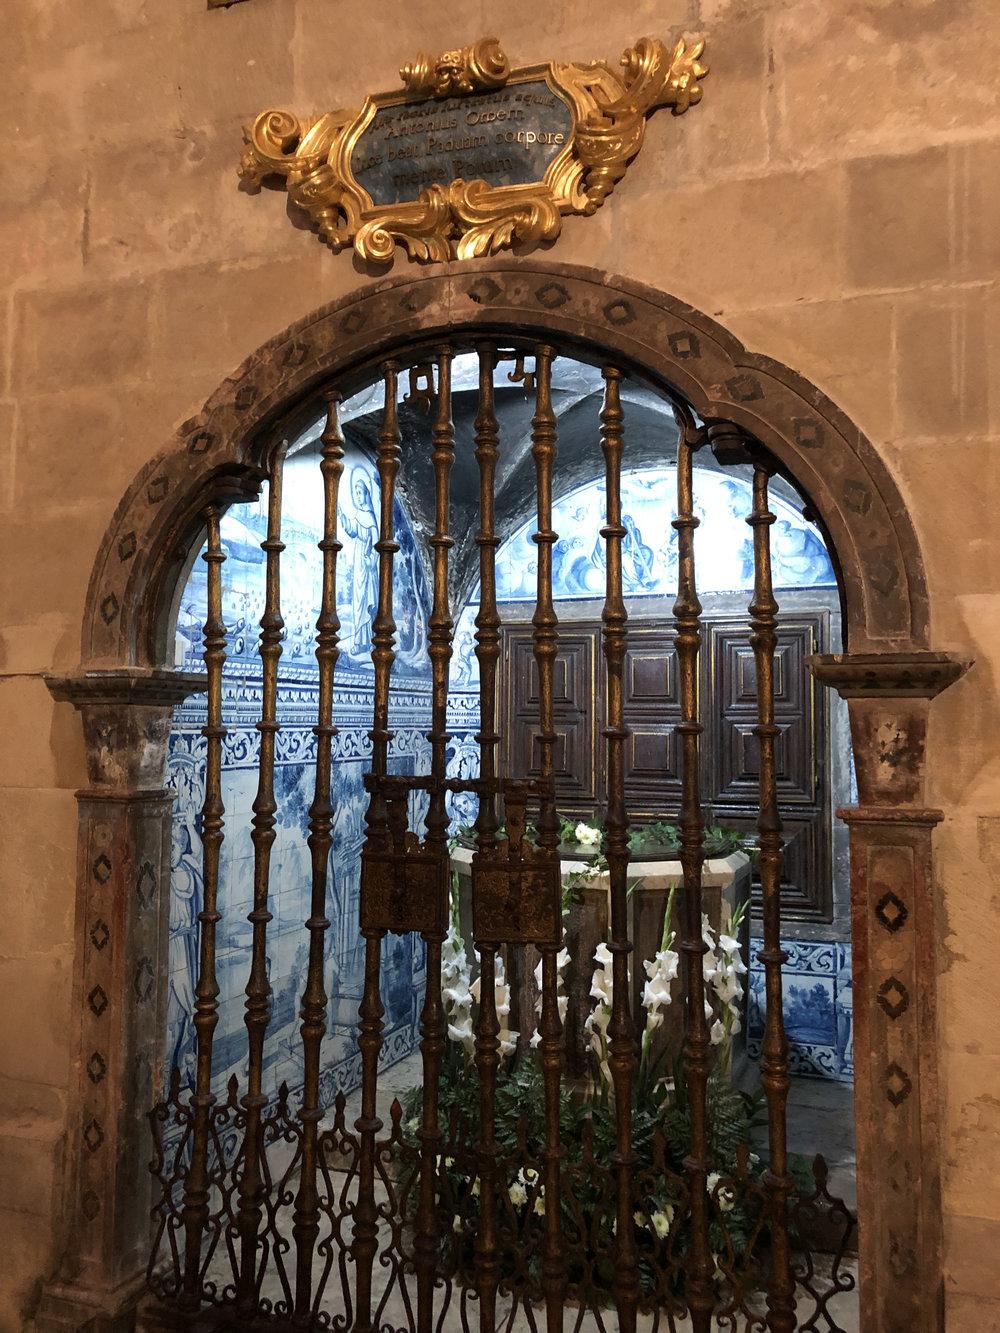 teri_lisbon_portugal_cathedral_spiritedtable_photo03.jpg